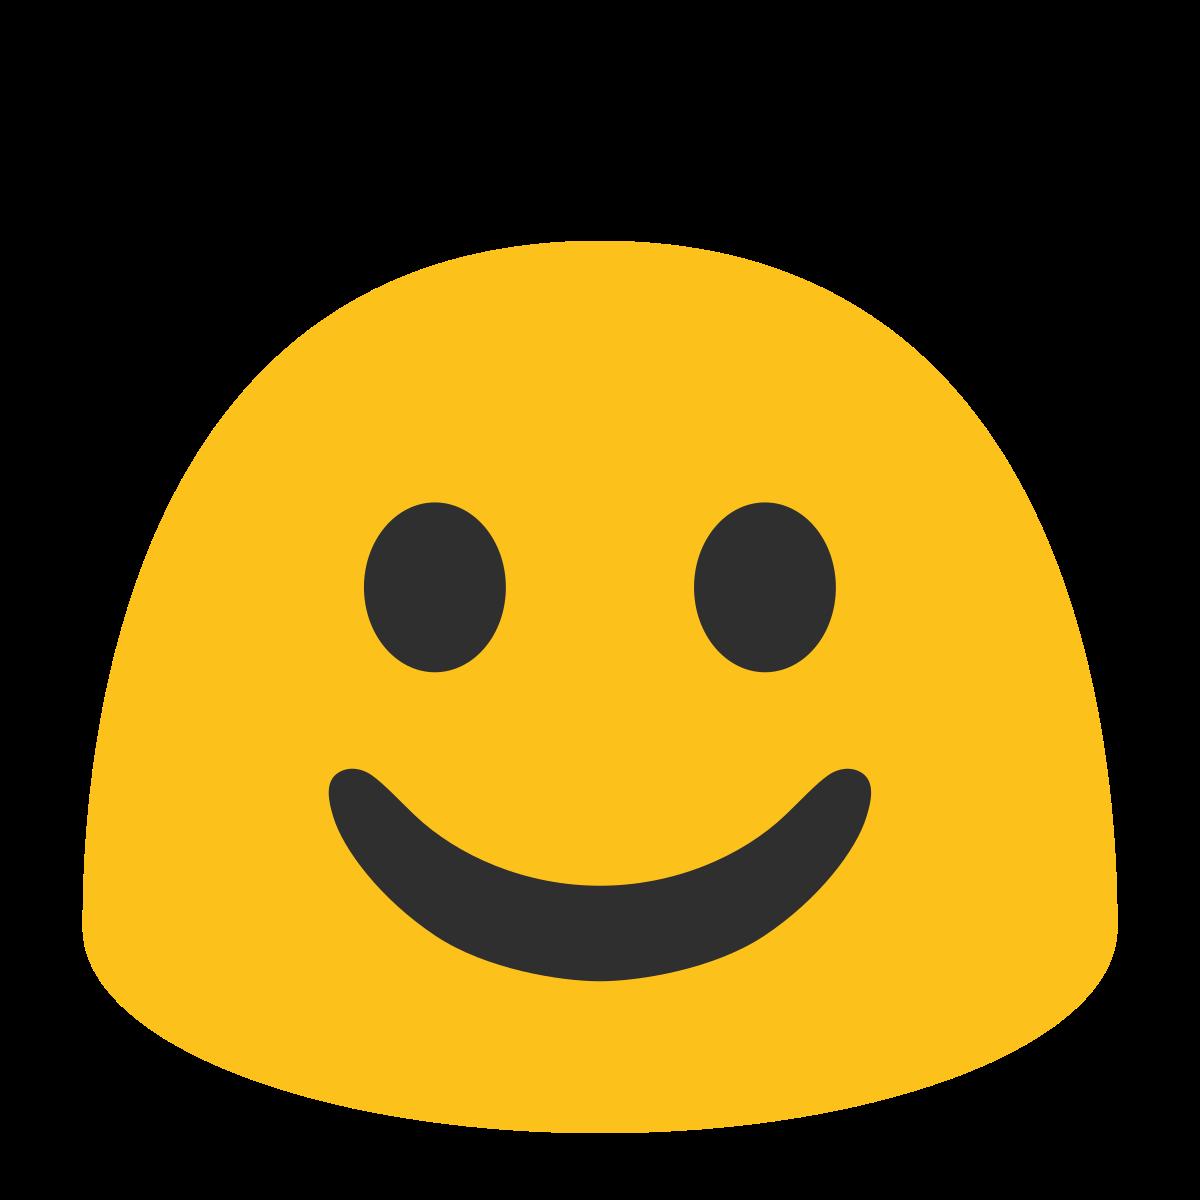 image transparent Collection of free taco. Vector emojis calendar